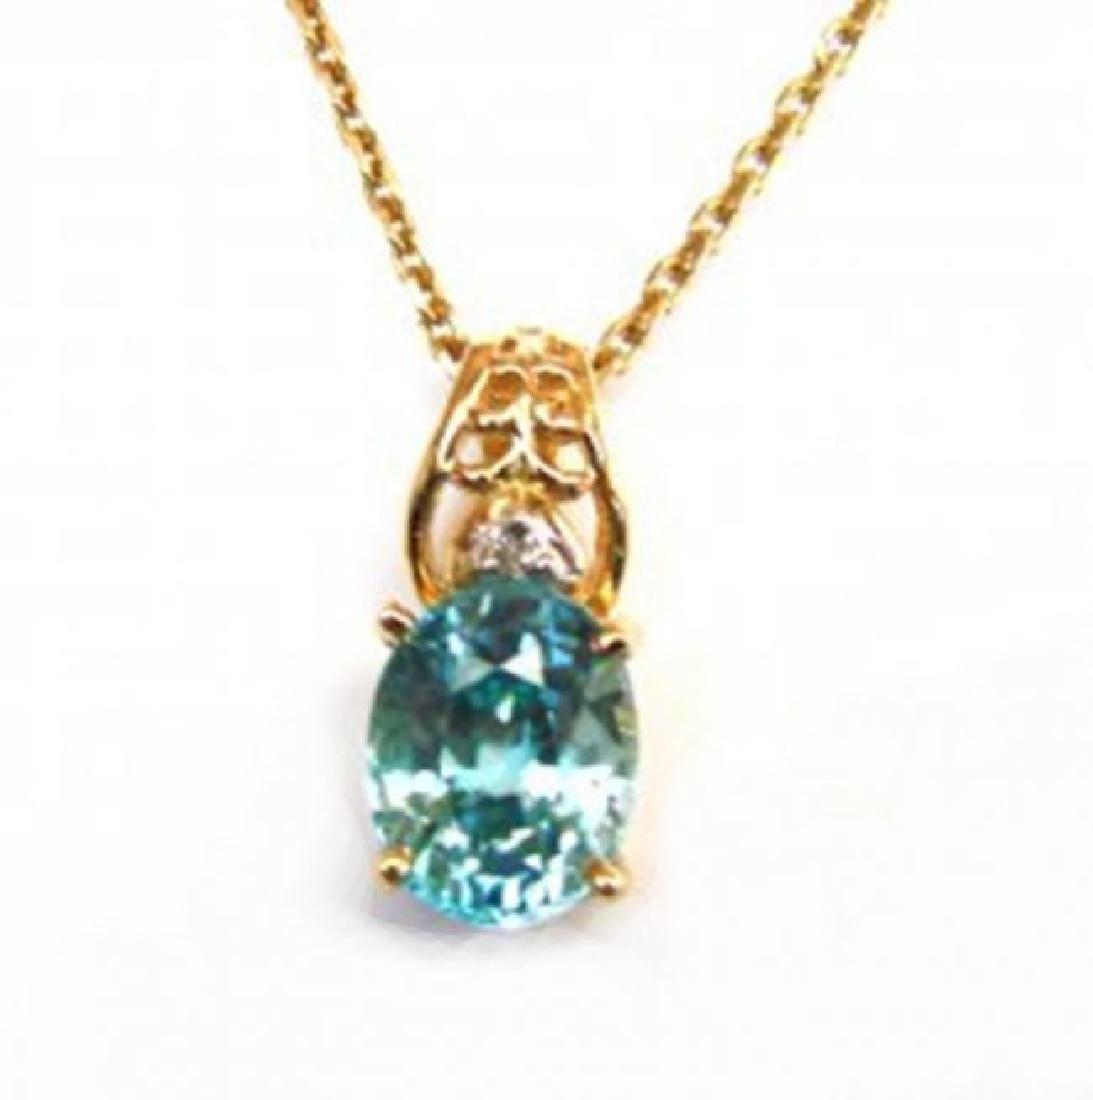 Diamond Blue Zircon Pendant 4.53Ct 14k Y/G